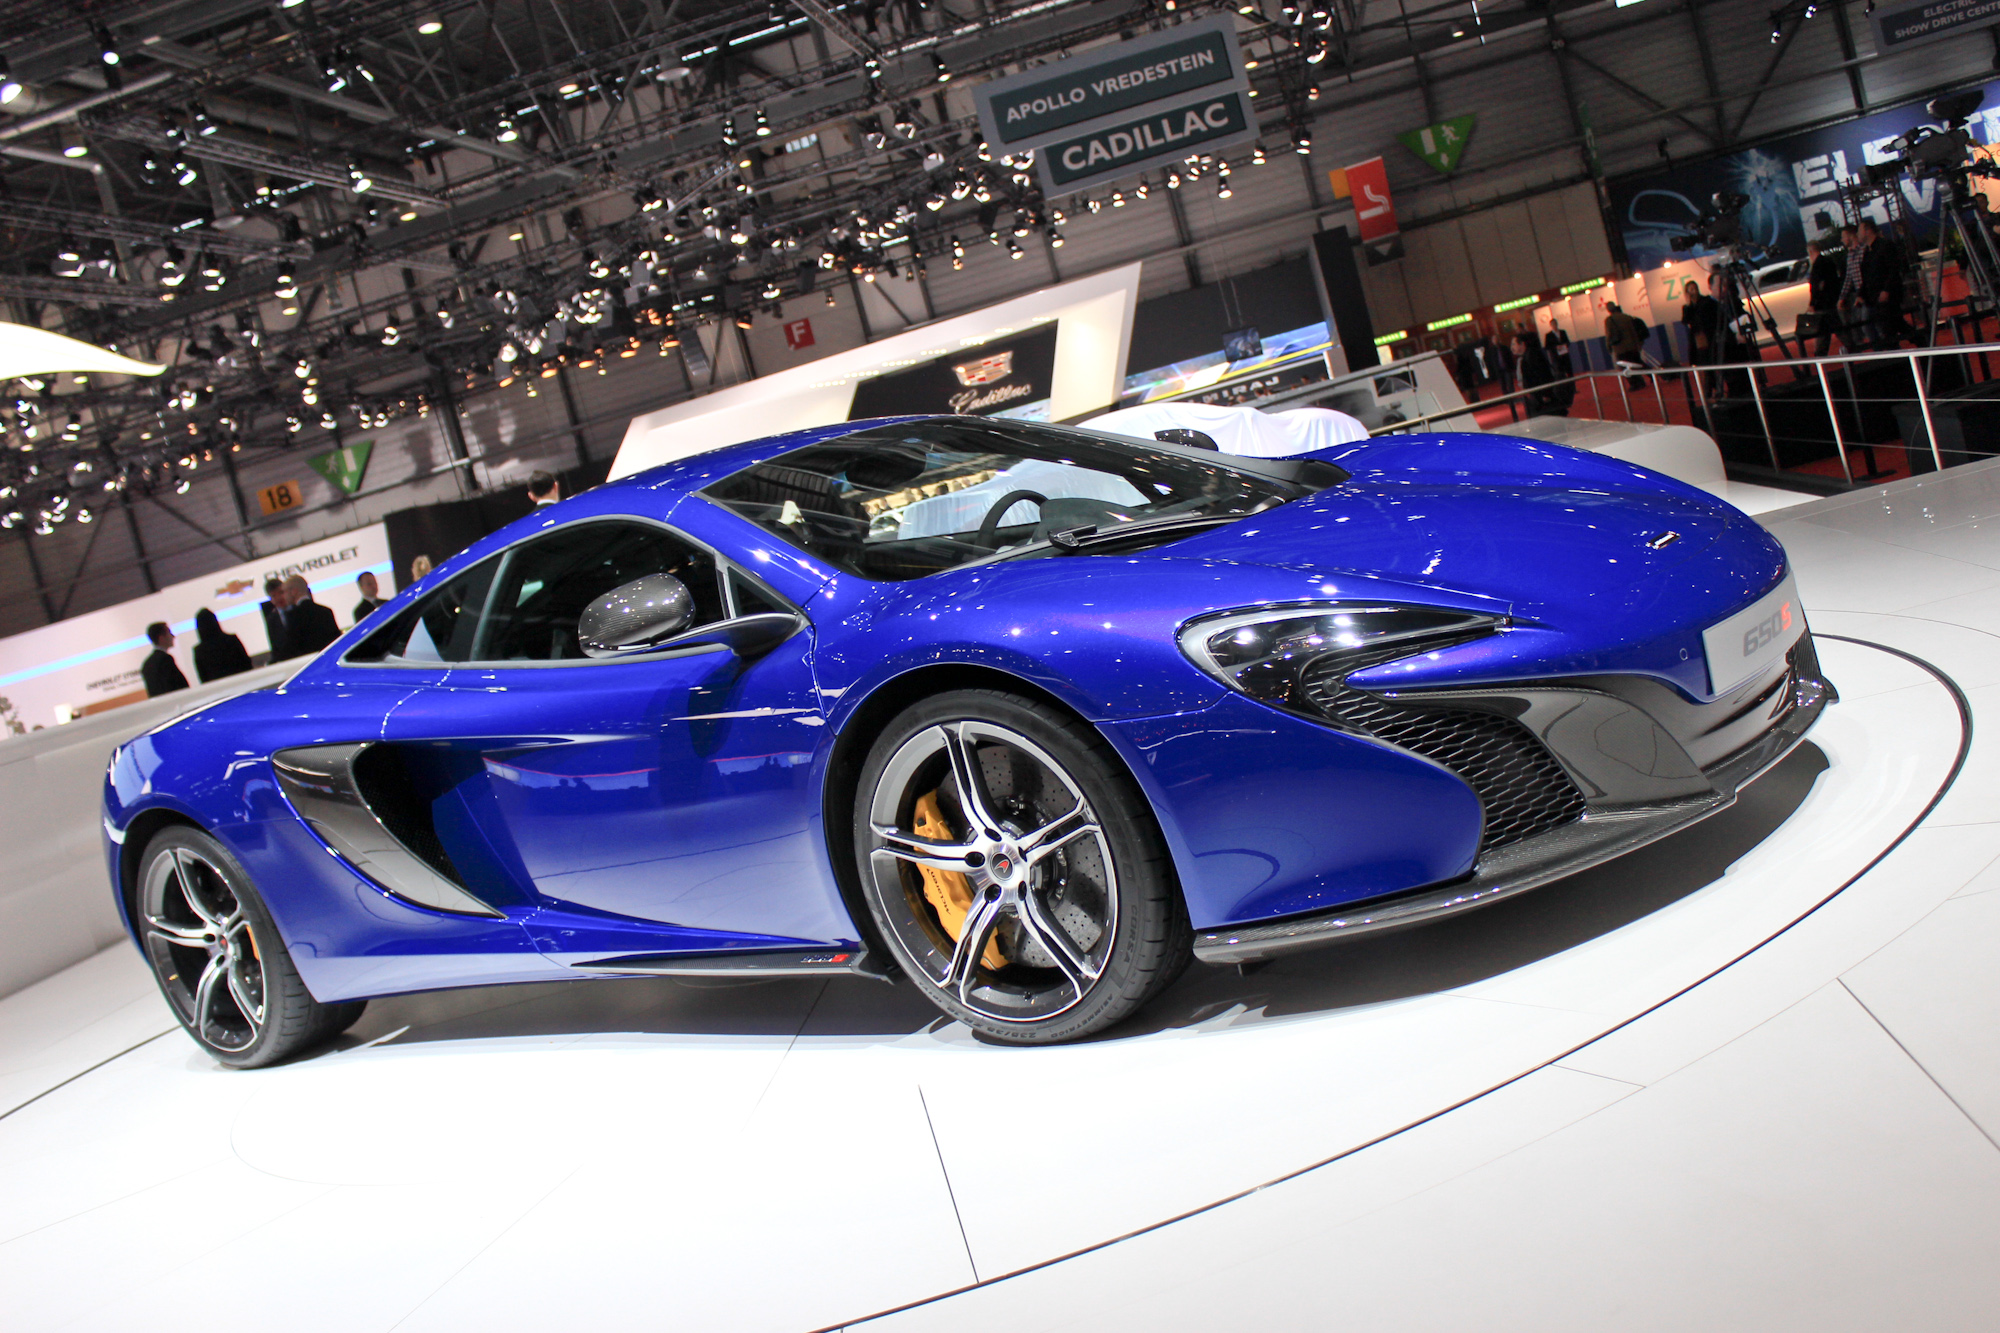 McLaren 650S Supercar: 2014 Geneva Motor Show Video And Live Photos